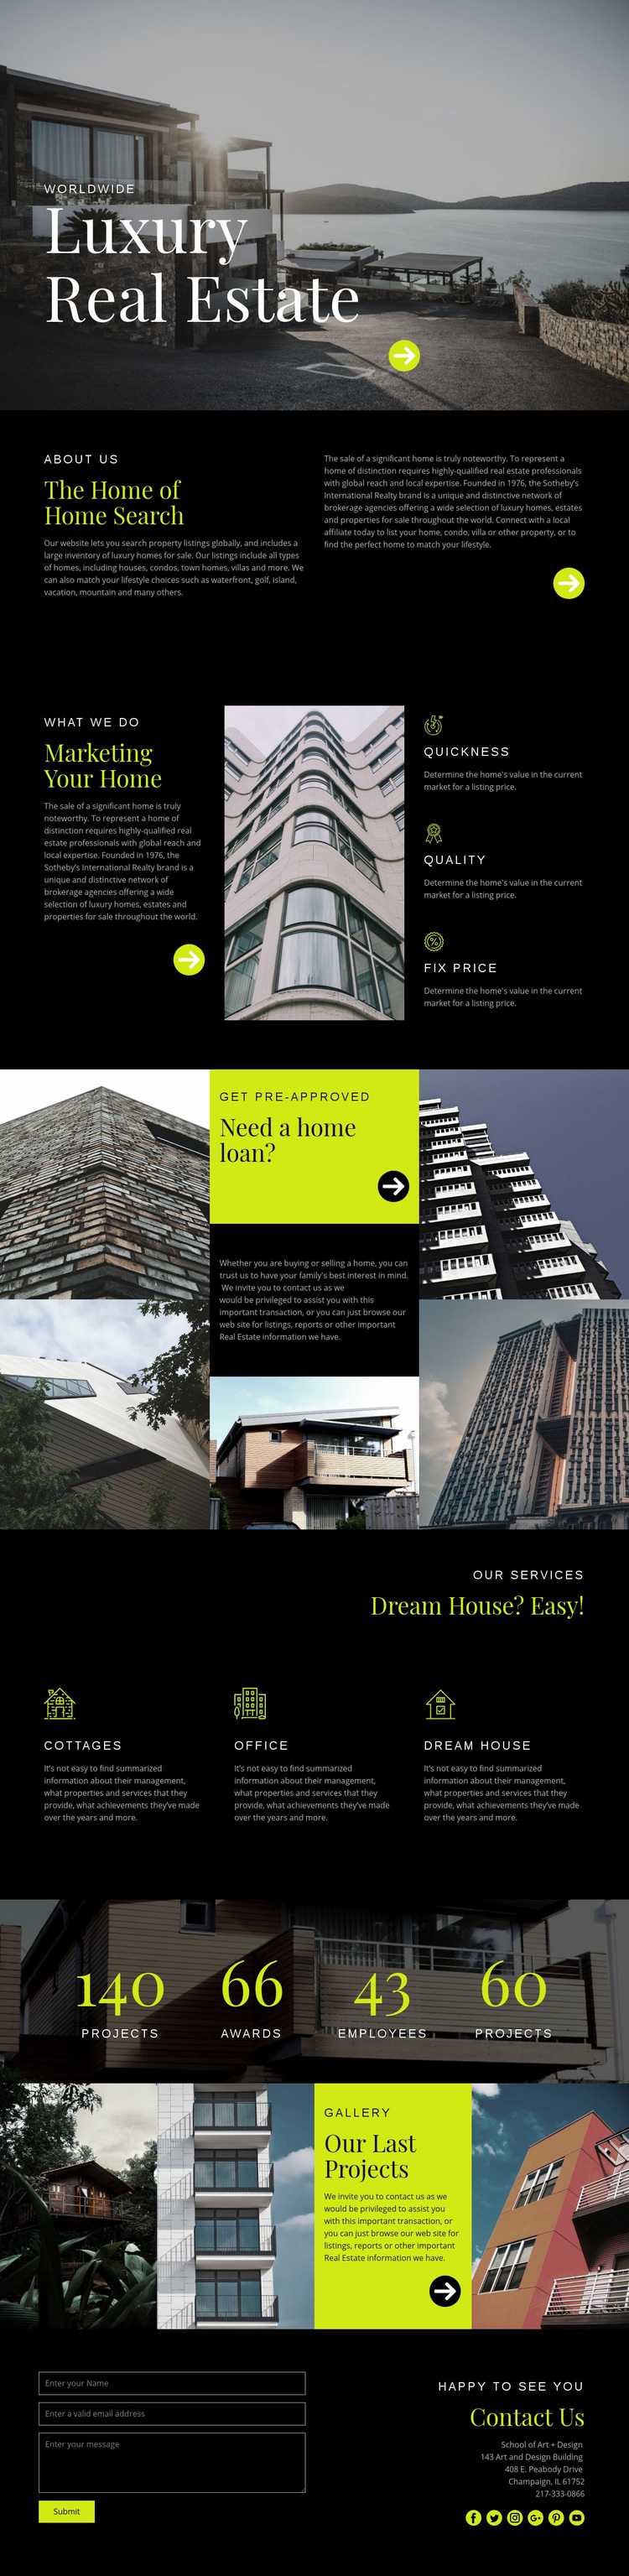 Luxury real estate Web Page Designer